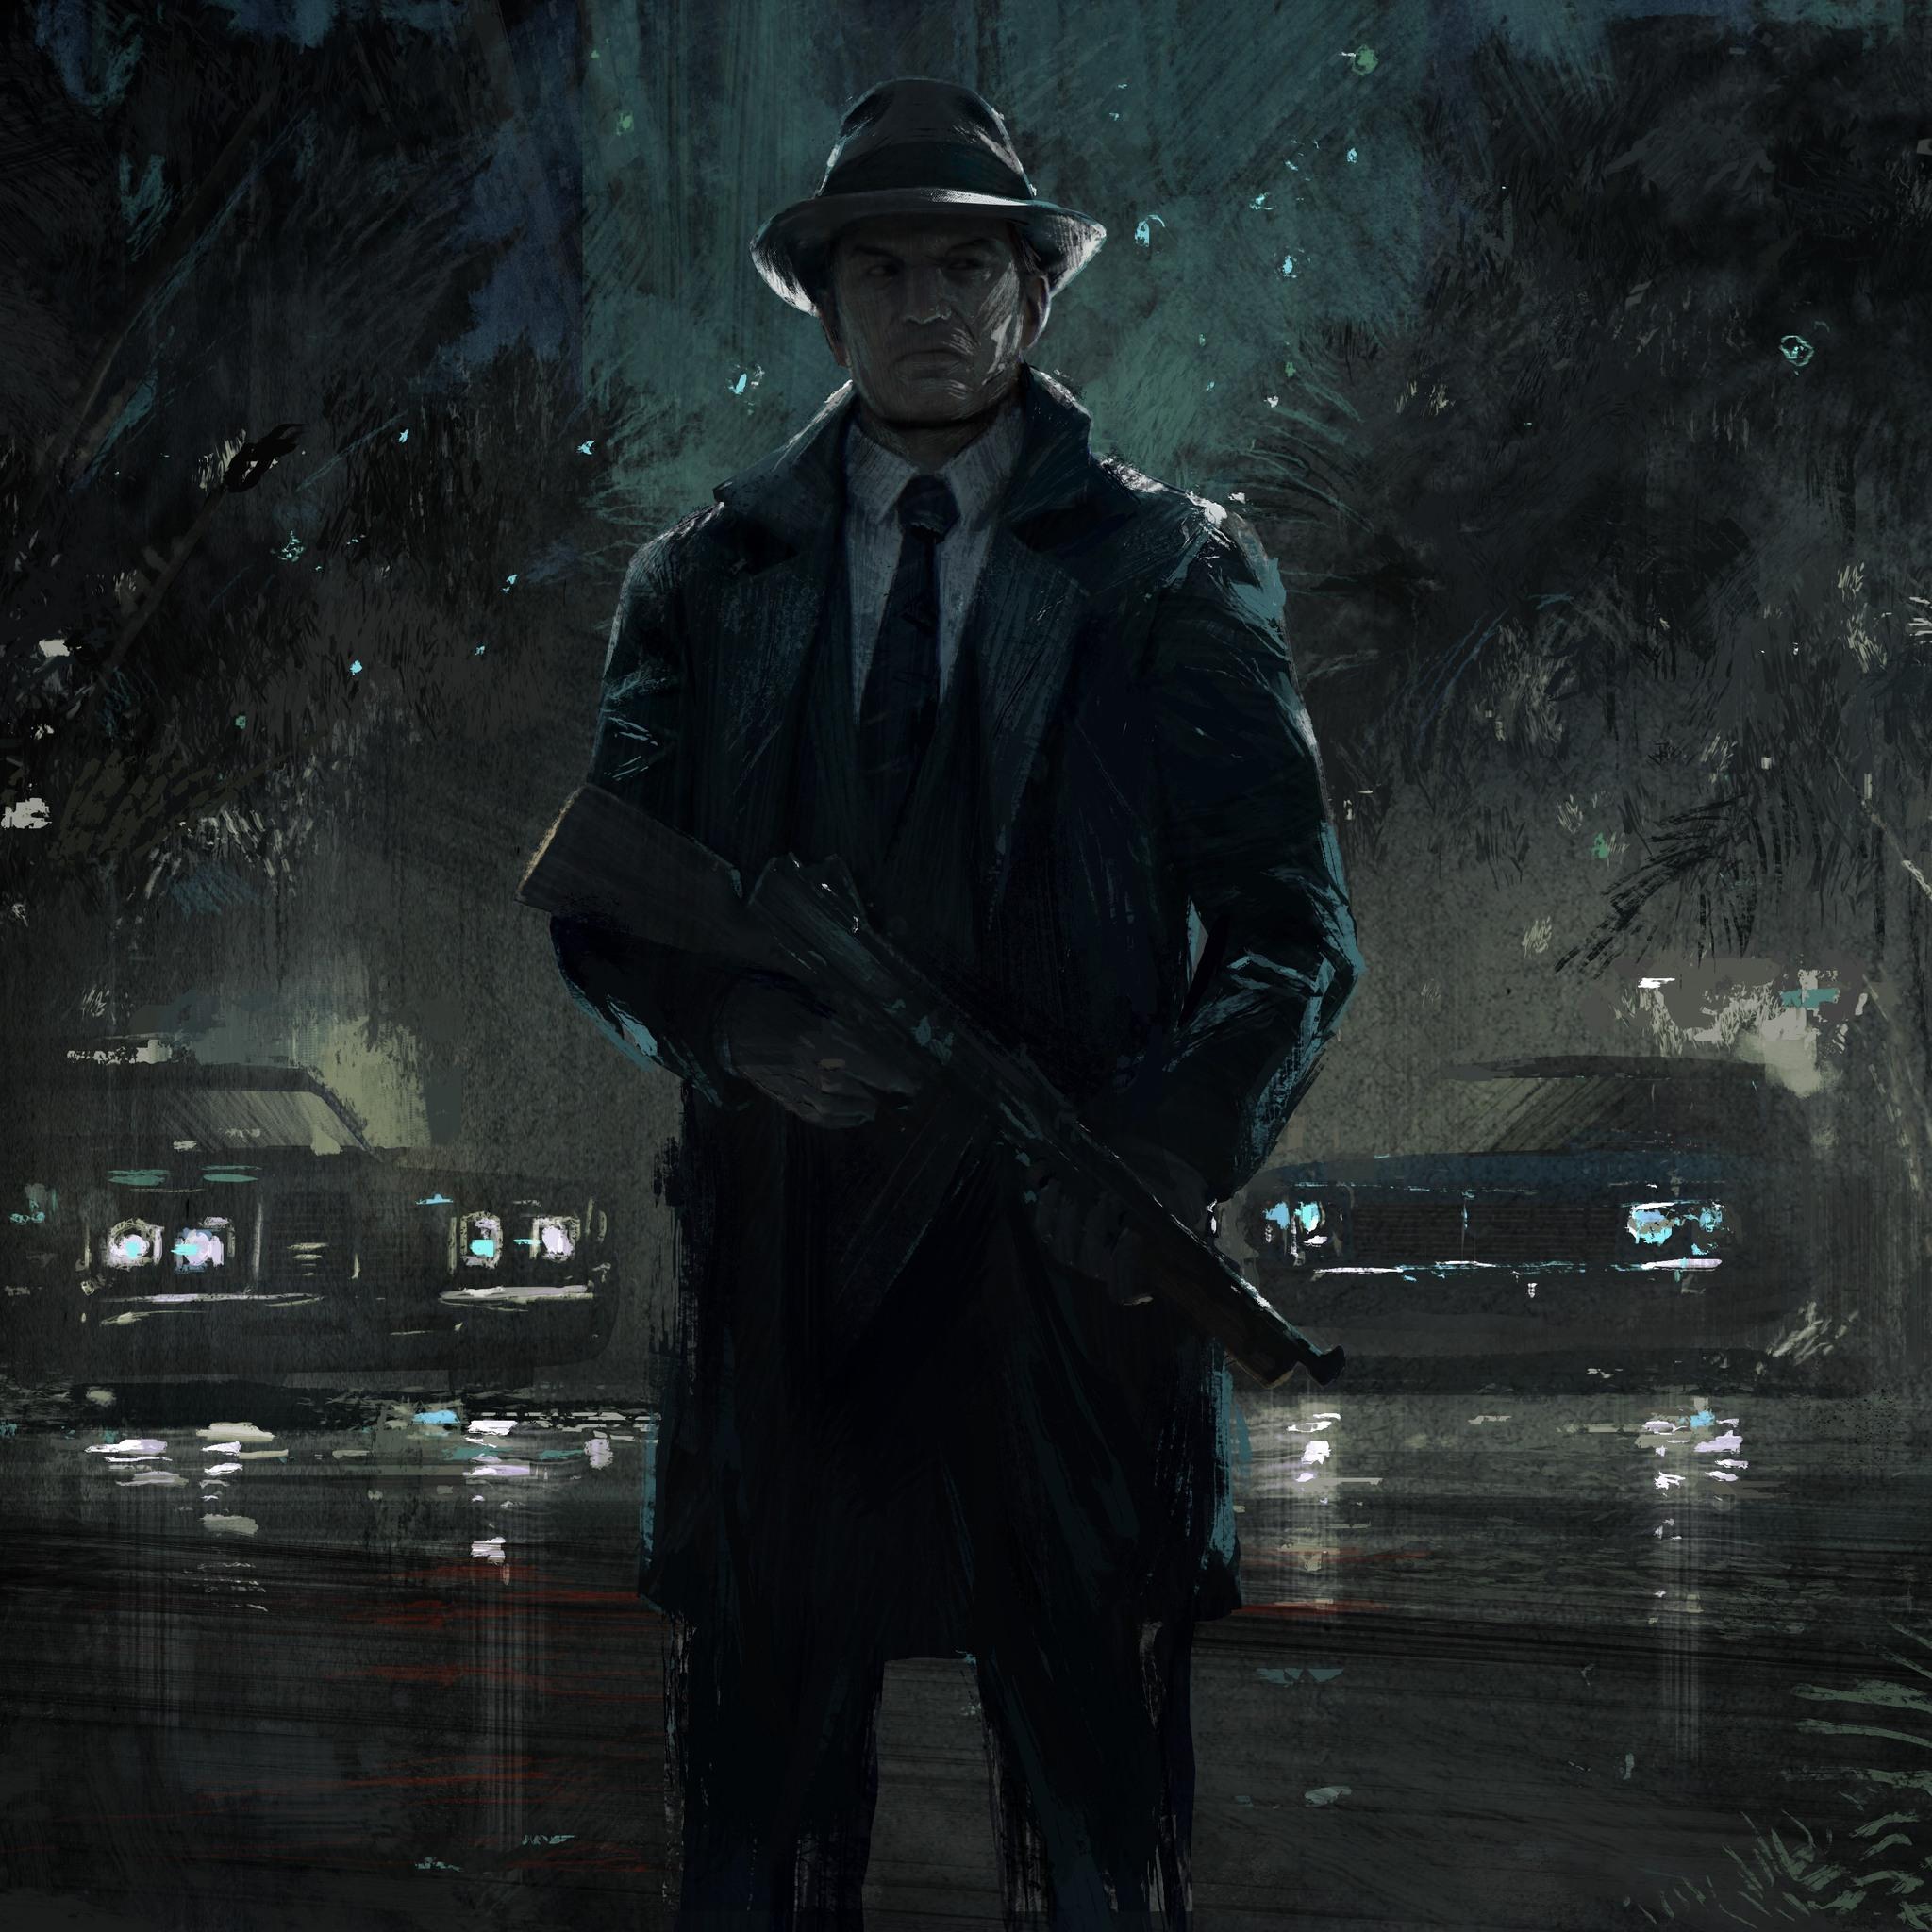 mafia-3-artwork-sd.jpg